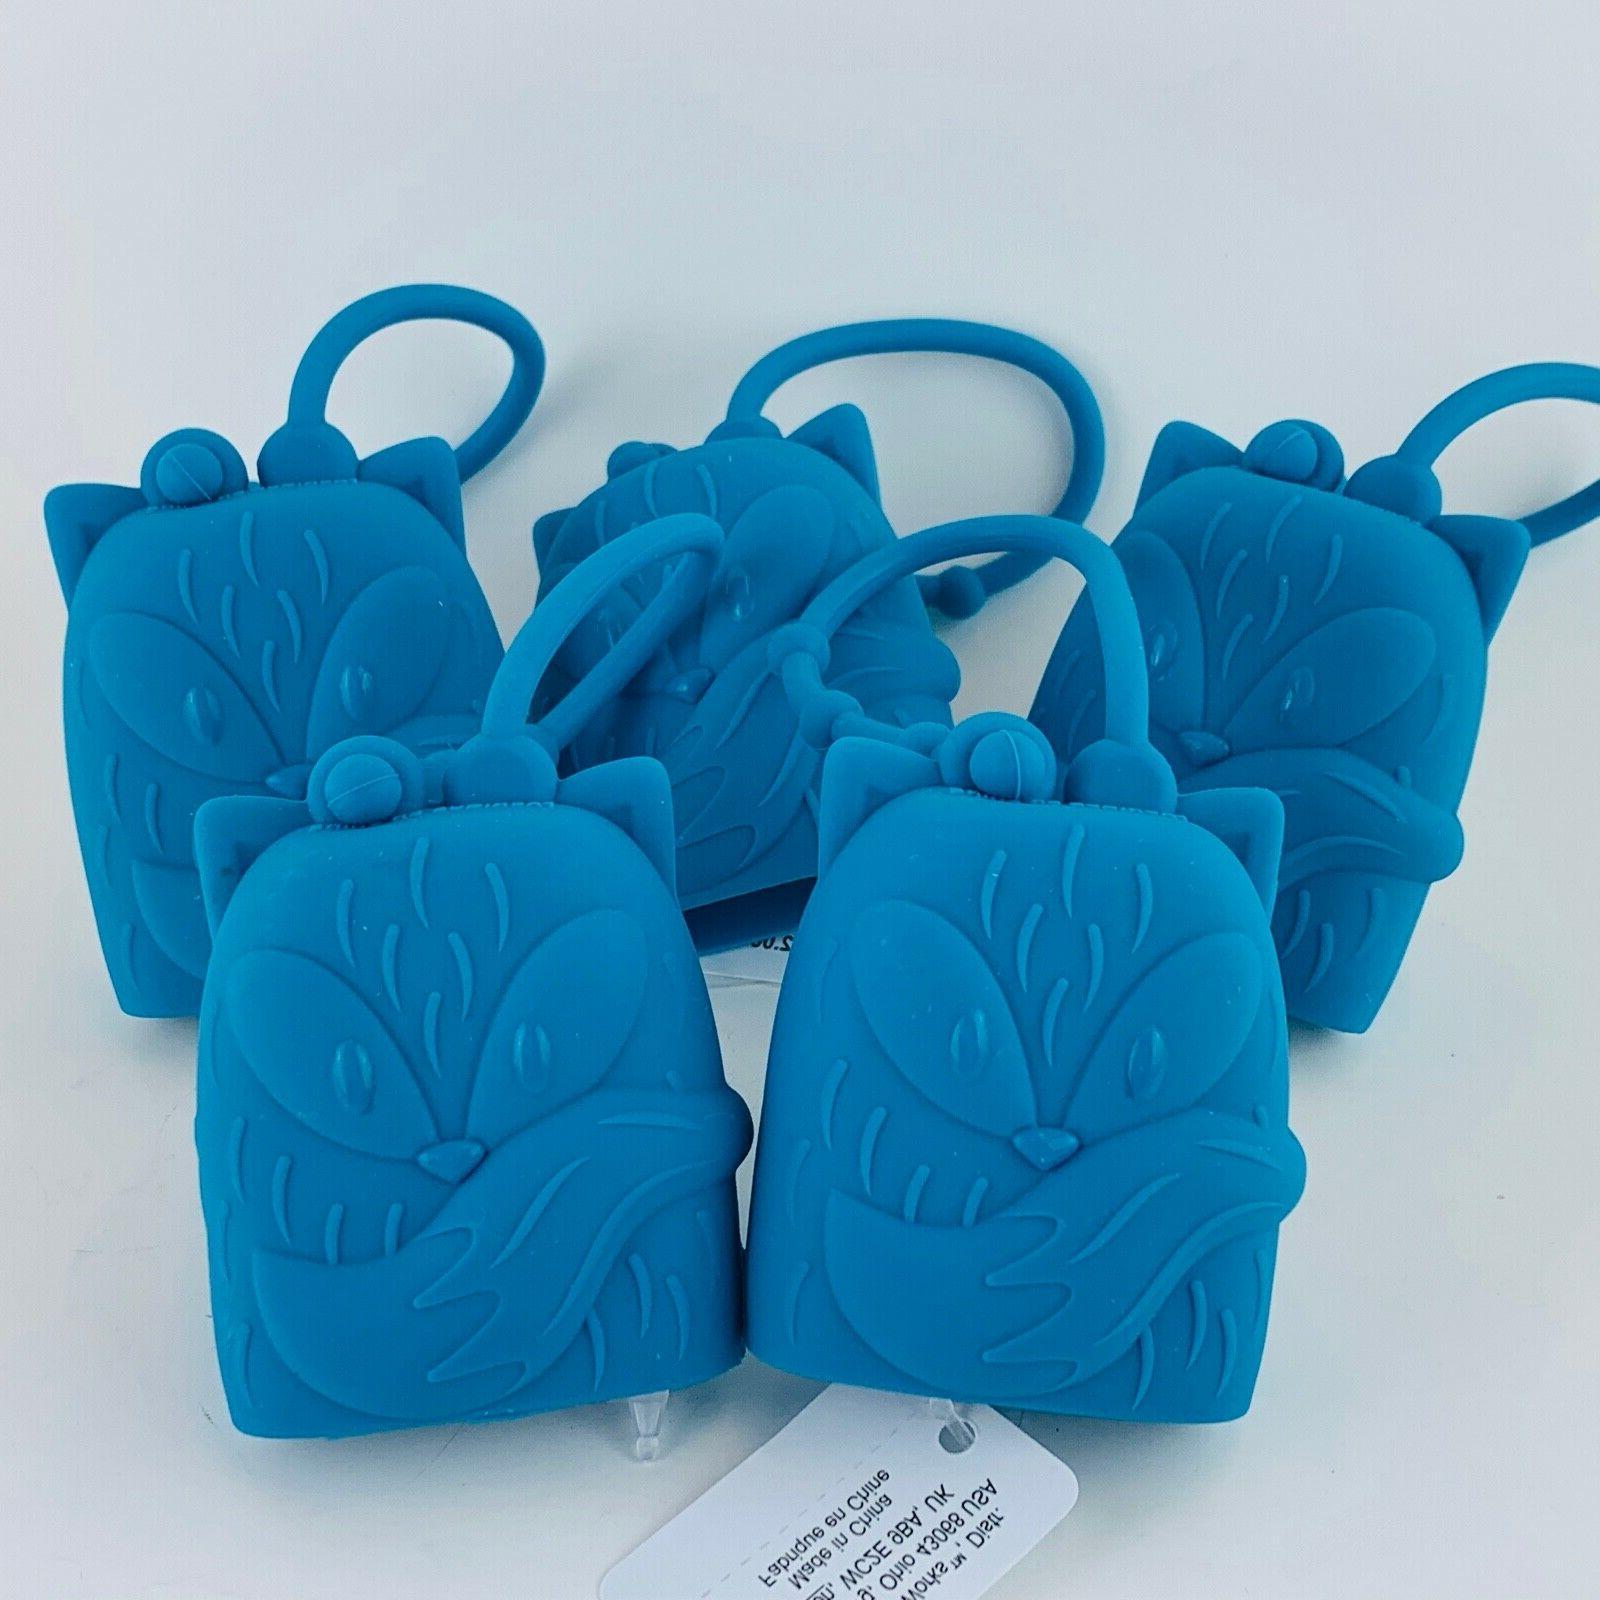 6 Bath & Body Works Fox Holder Sleeve Sanitizer